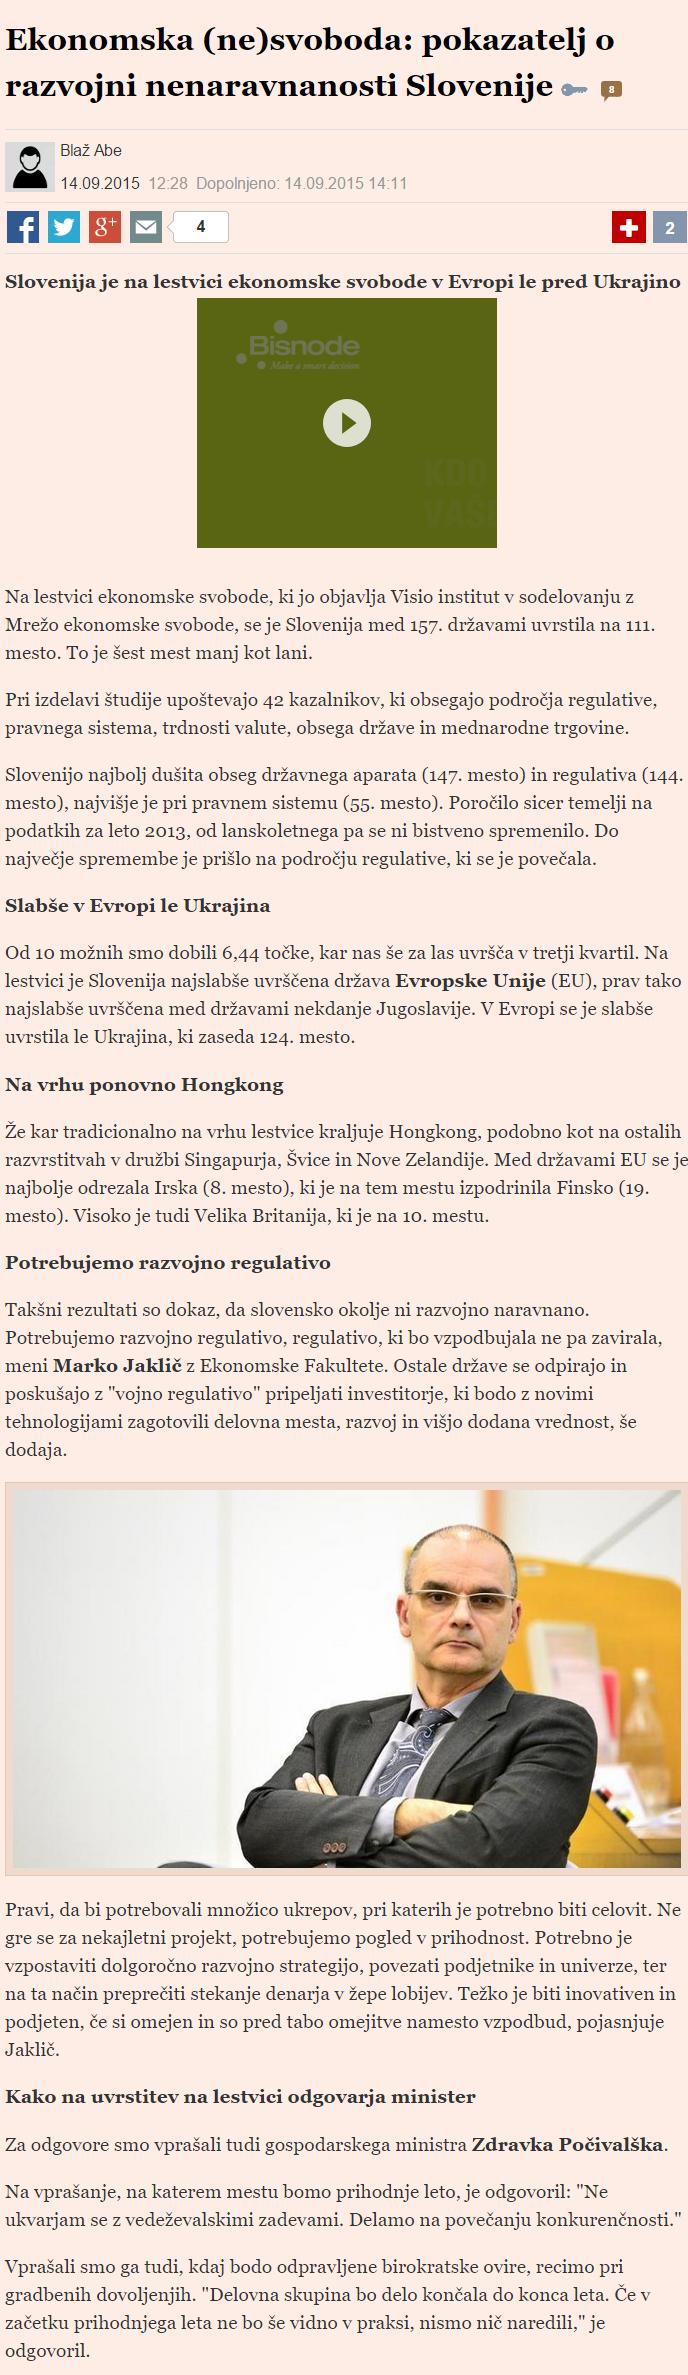 screencapture-www-finance-si-8835694-Ekonomska-ne-svoboda-pokazatelj-o-razvojni-nenaravnanosti-Slovenije-1443093363806